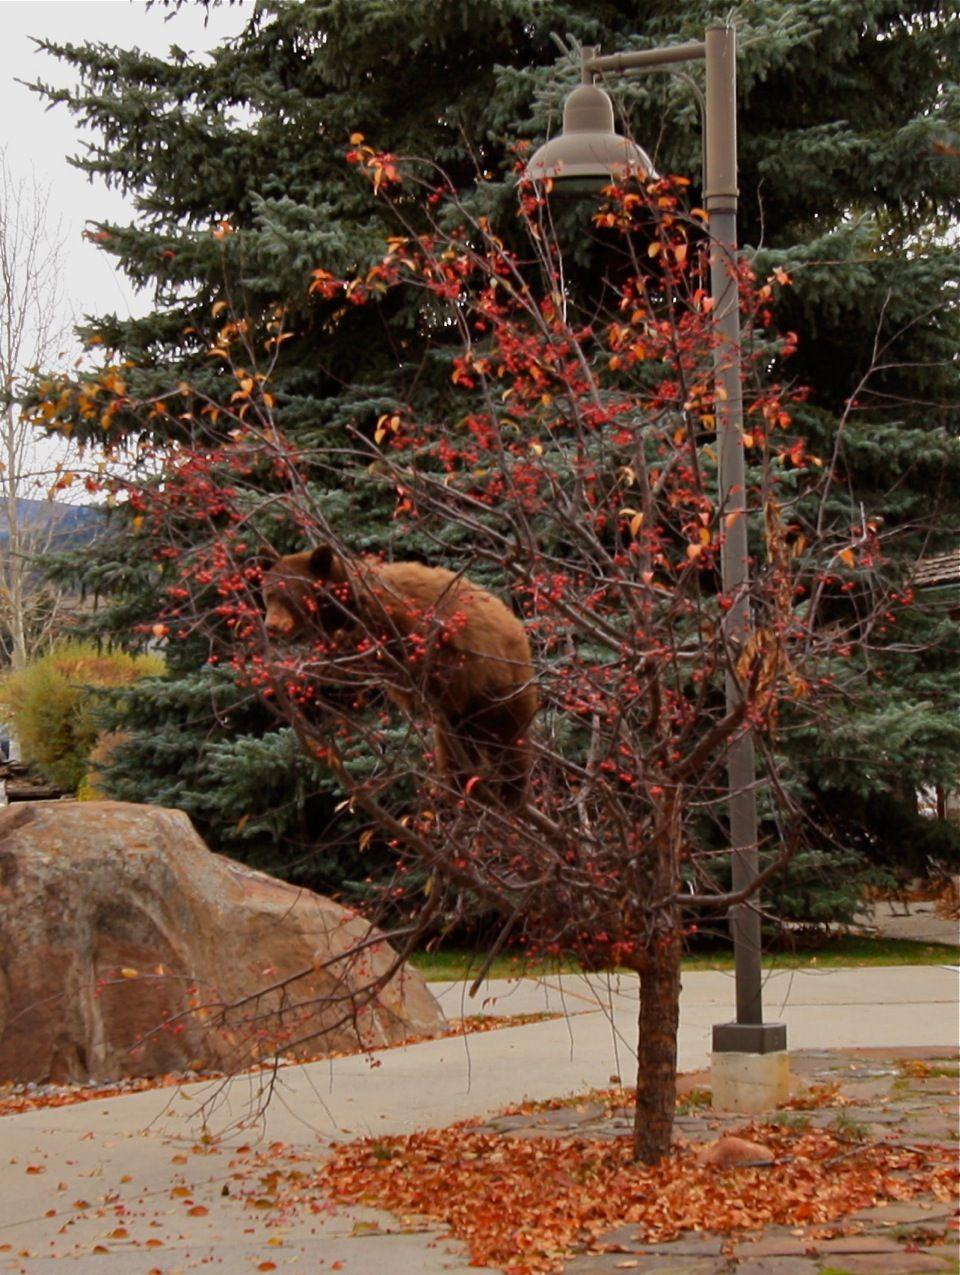 Little cinnamon bear hanging around Meadow Village!   Photo credit: Casey Drayton